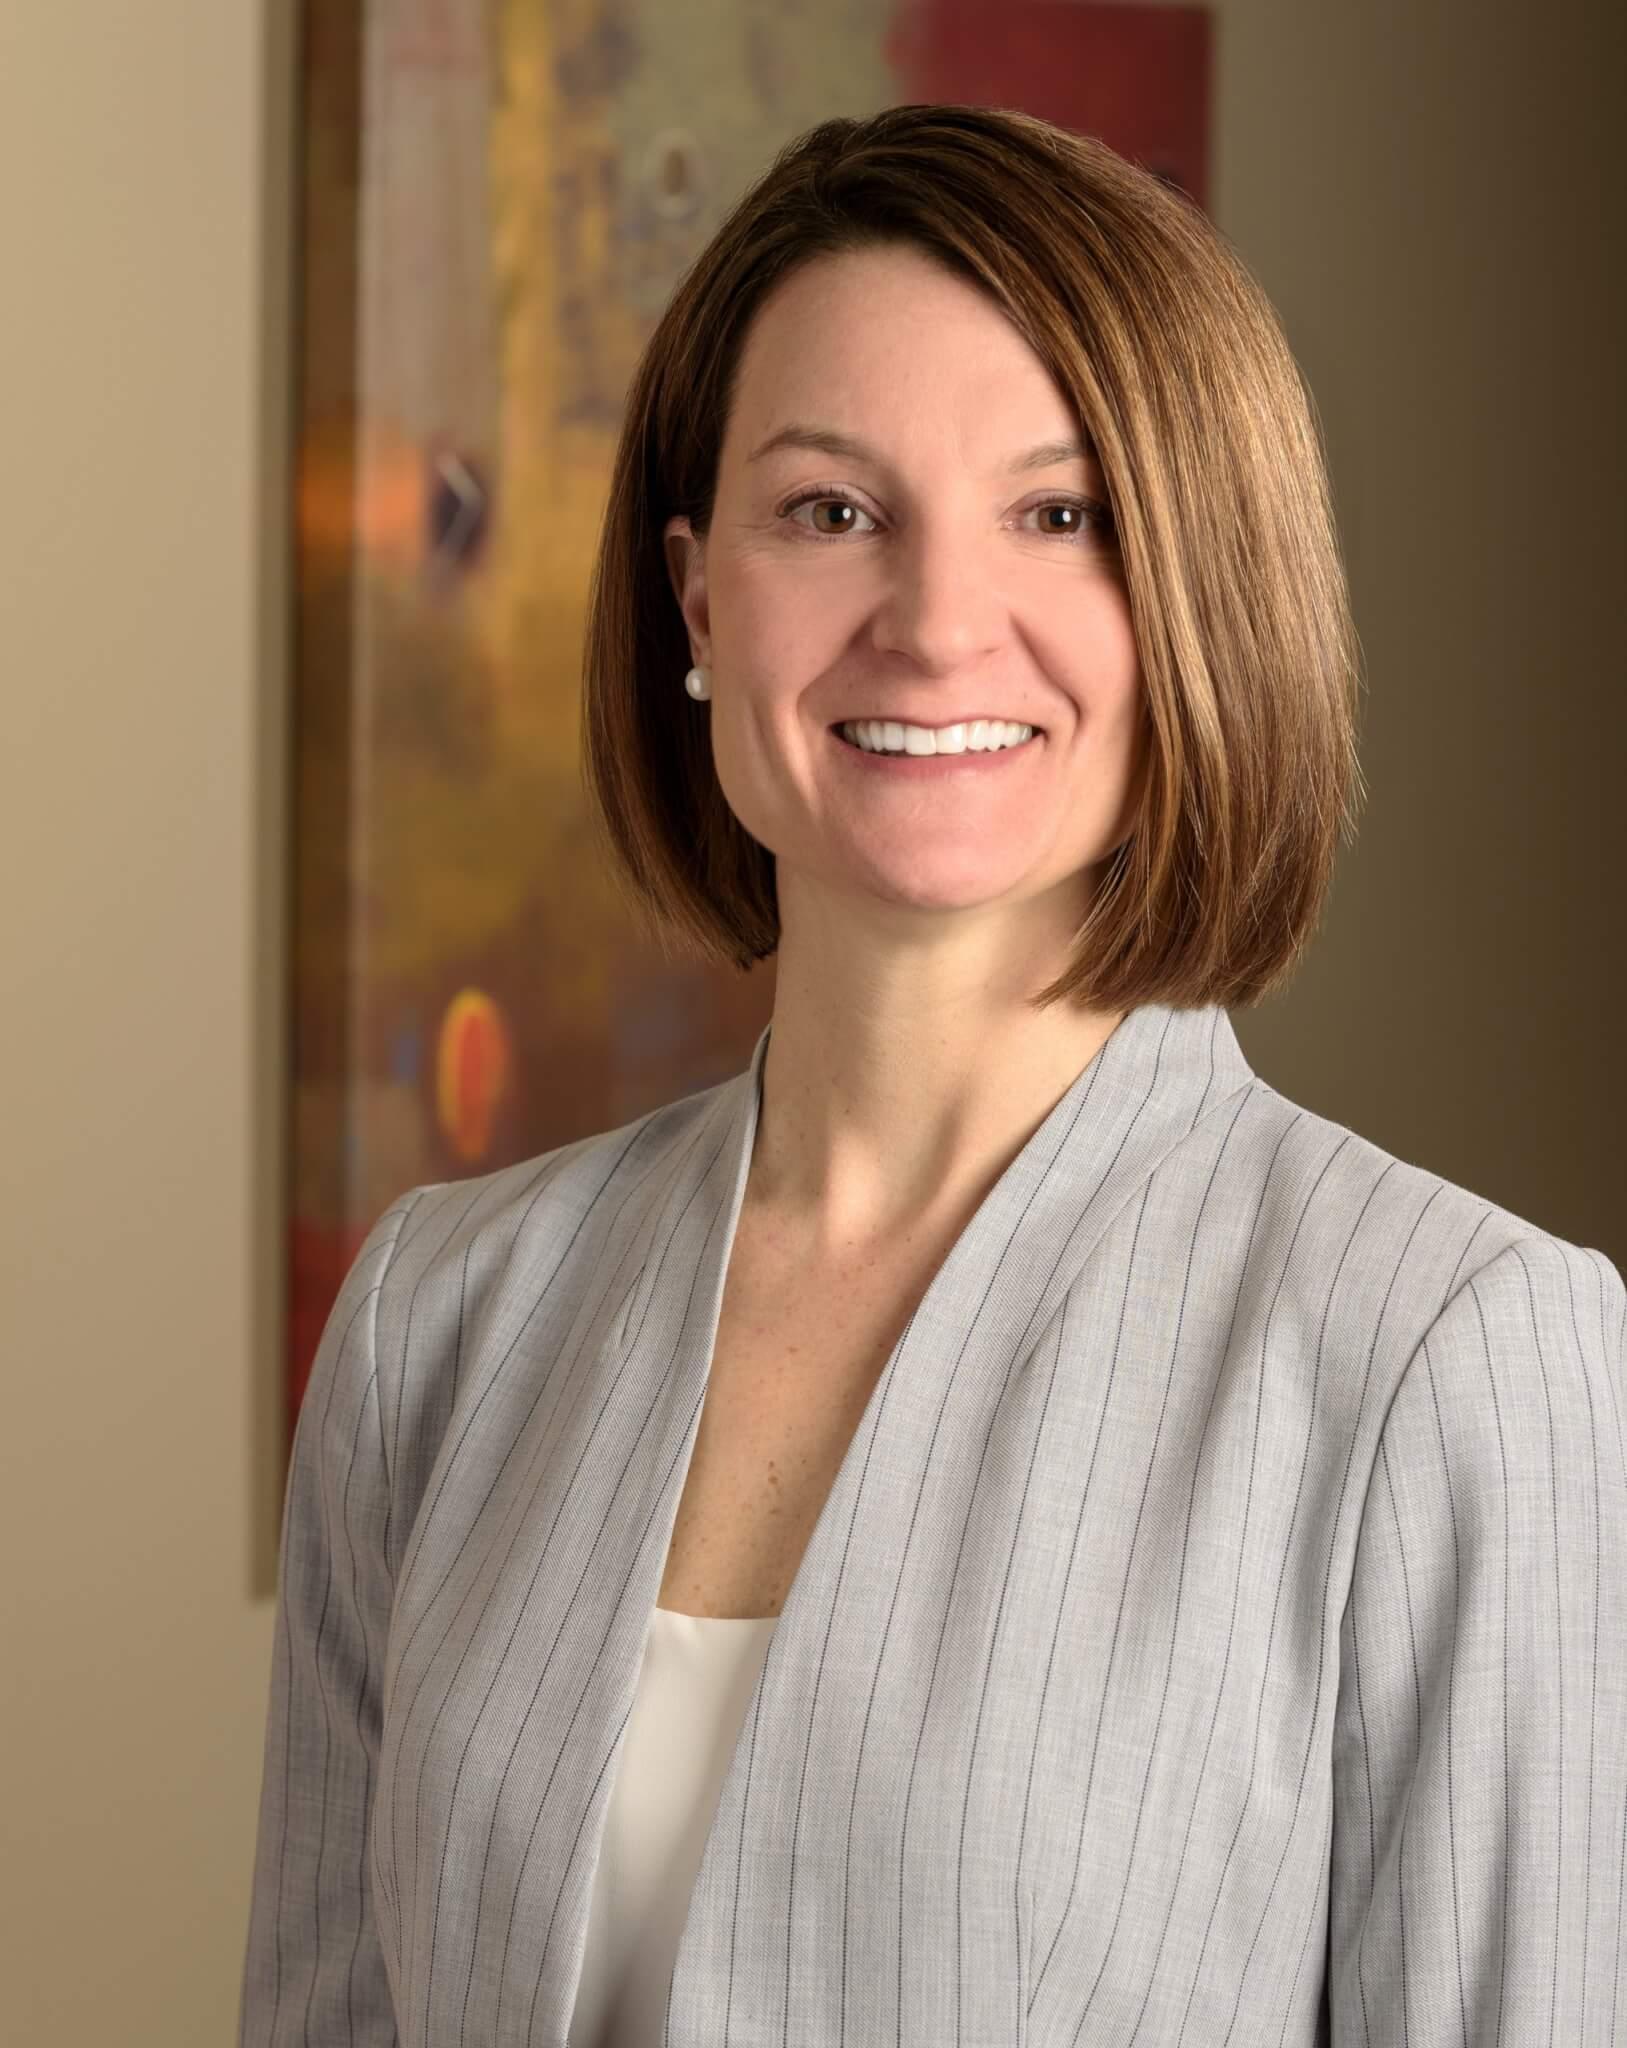 Dr. Rebecca Roedersheimer